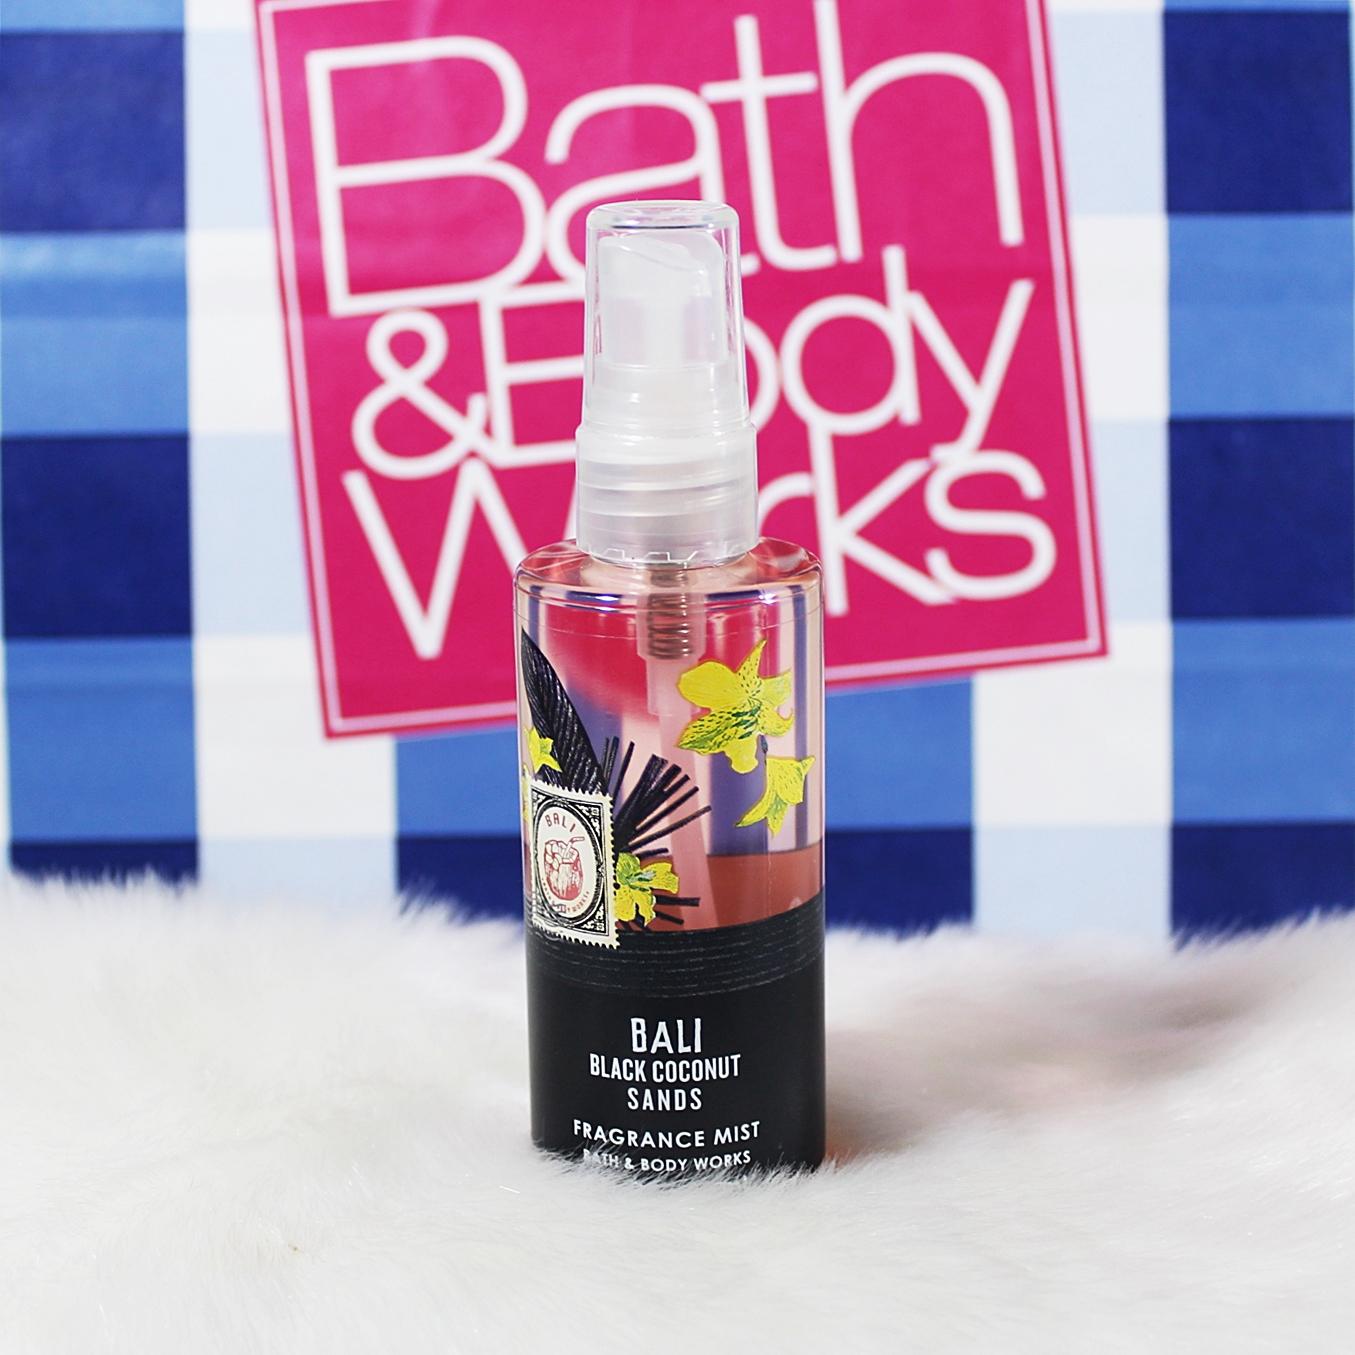 Bath & Body Works Bali Black Coconut Sands Travel Body Mist